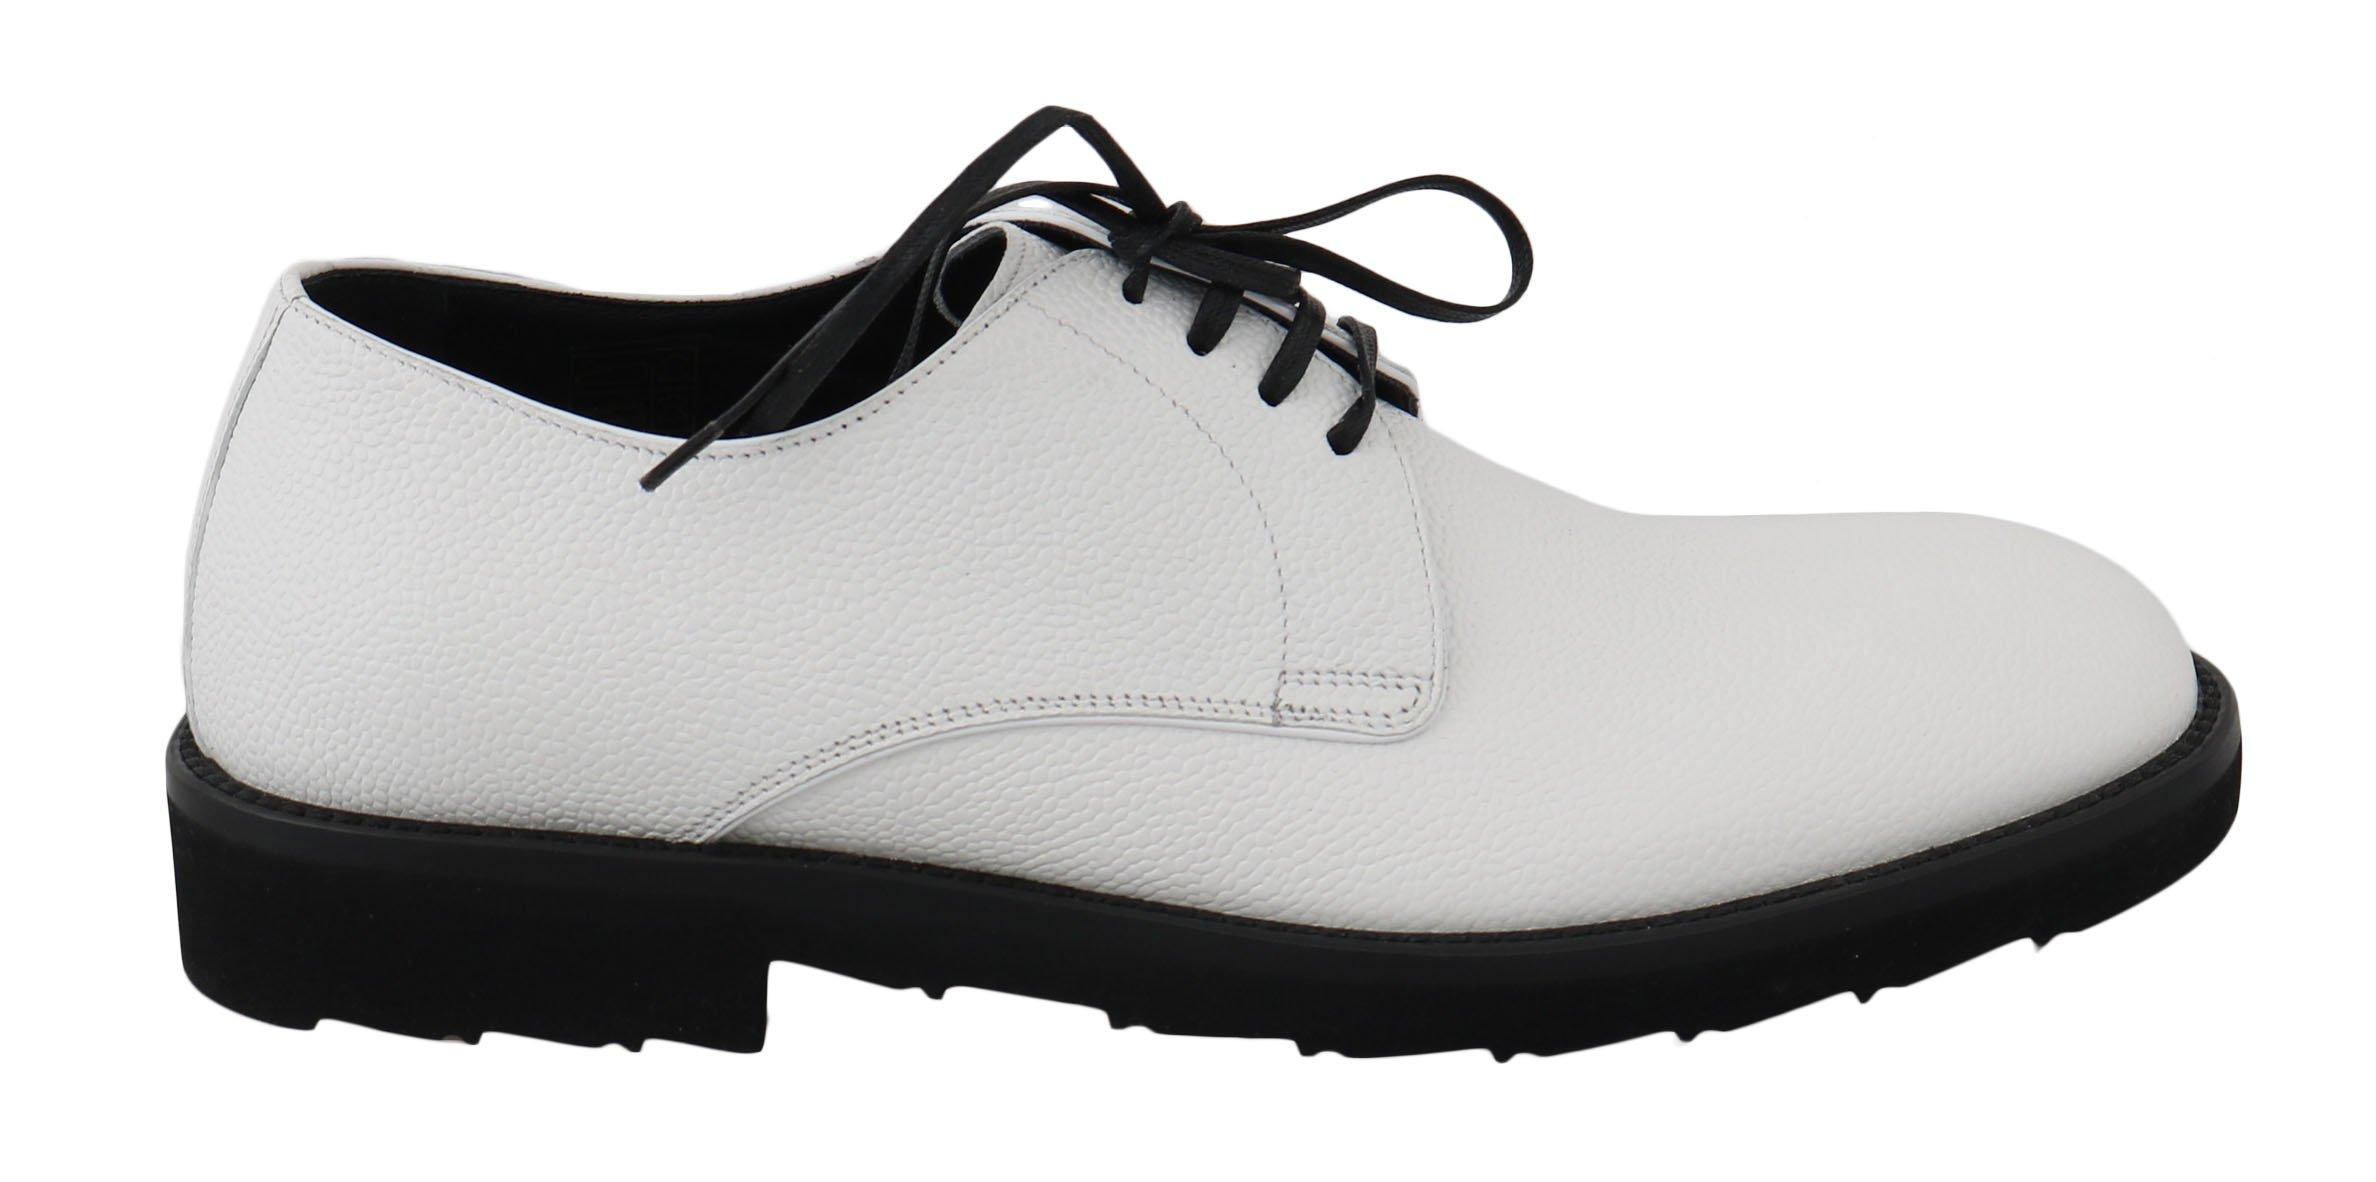 Dolce & Gabbana Men's Leather Dress Derby Shoes White MV2313 - EU39/US6